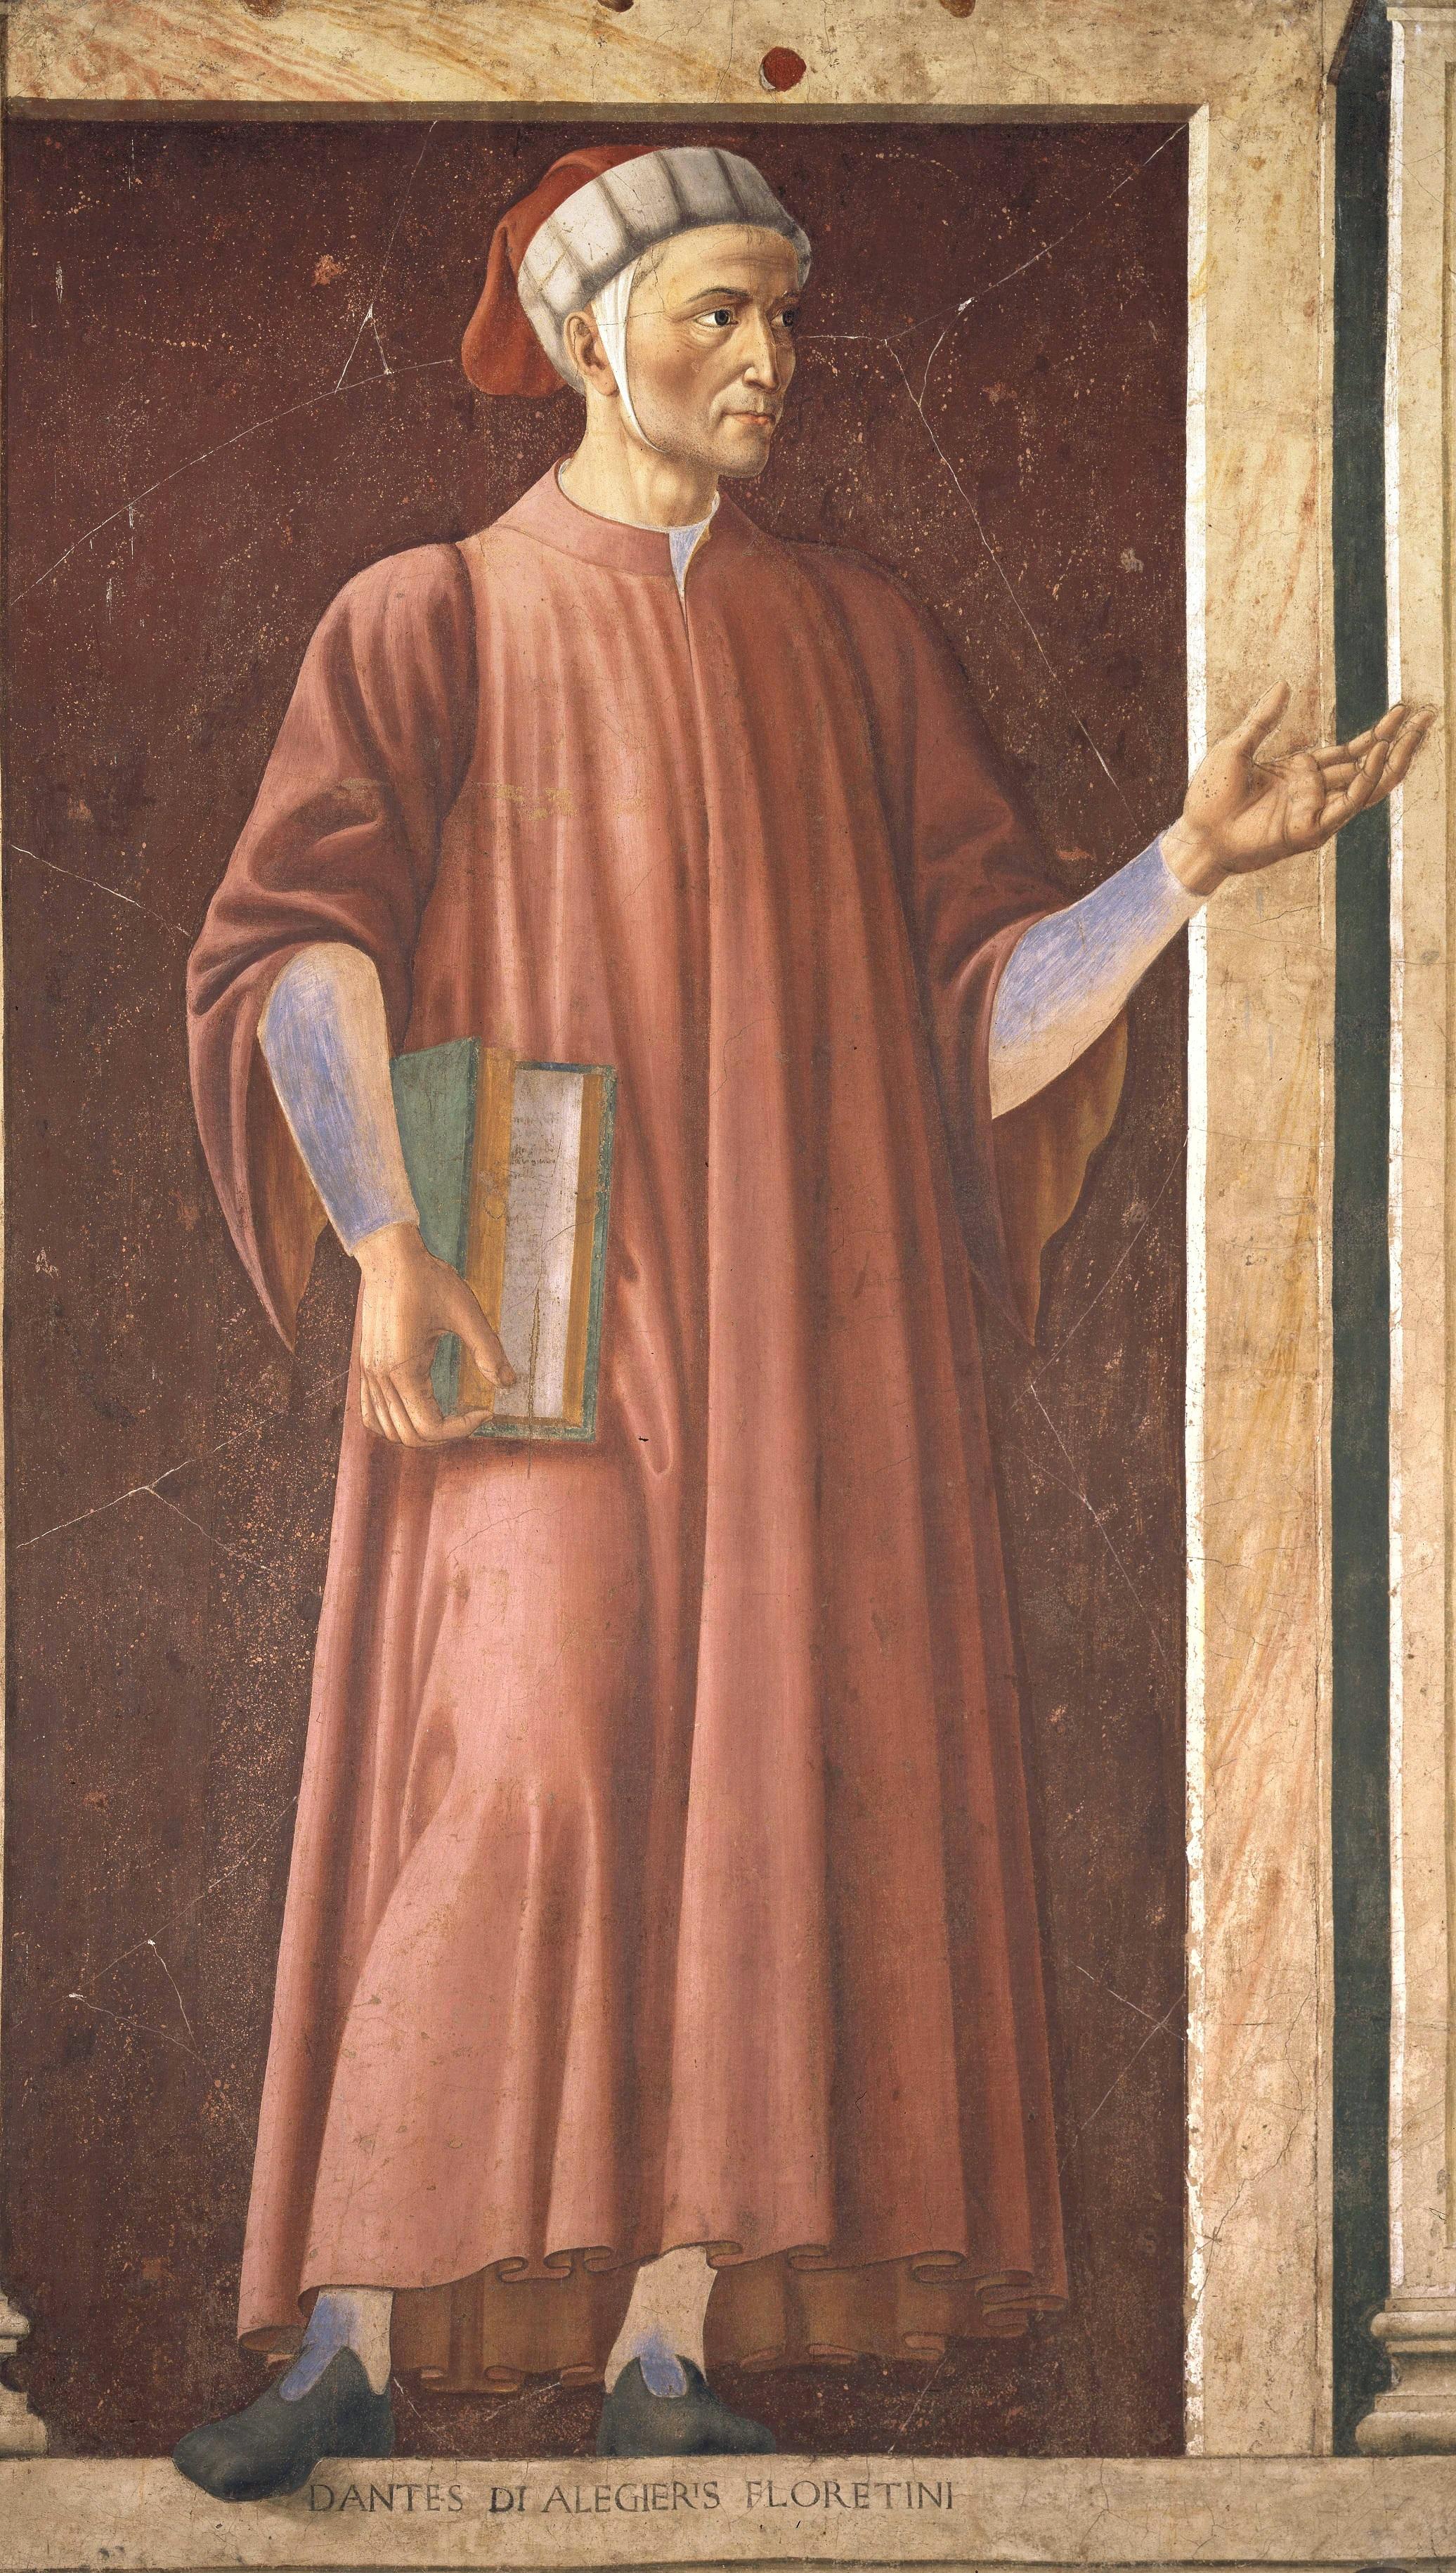 Dante Alighieri. Fresco von Andrea de Castagno, um 1450.